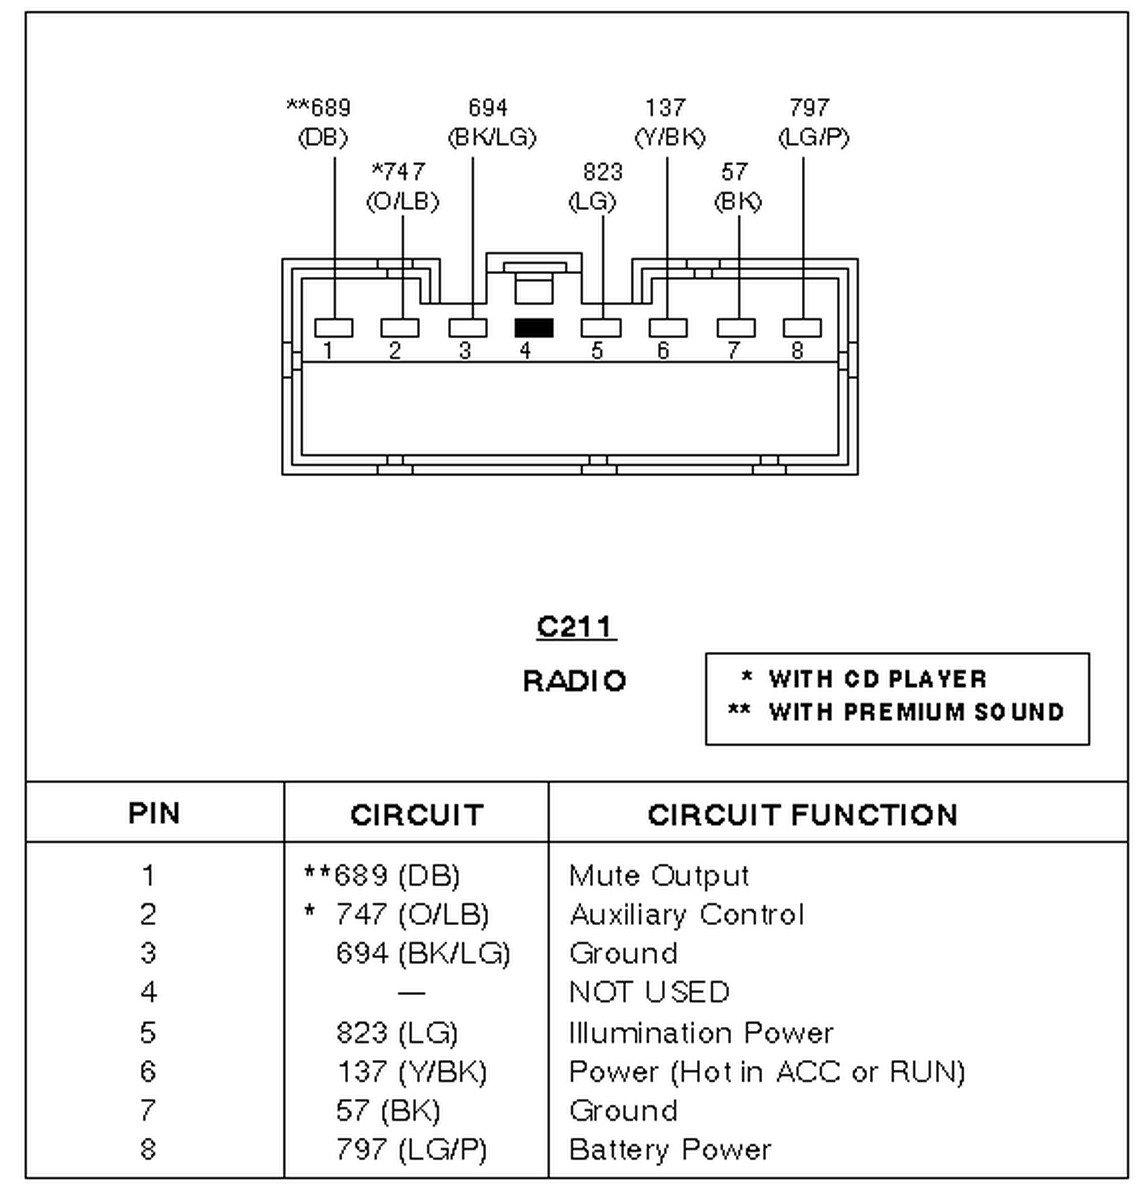 1989 Ford Crown Victoria Radio Wiring Diagram Wiring Diagrams Justify Sense A Justify Sense A Massimocariello It